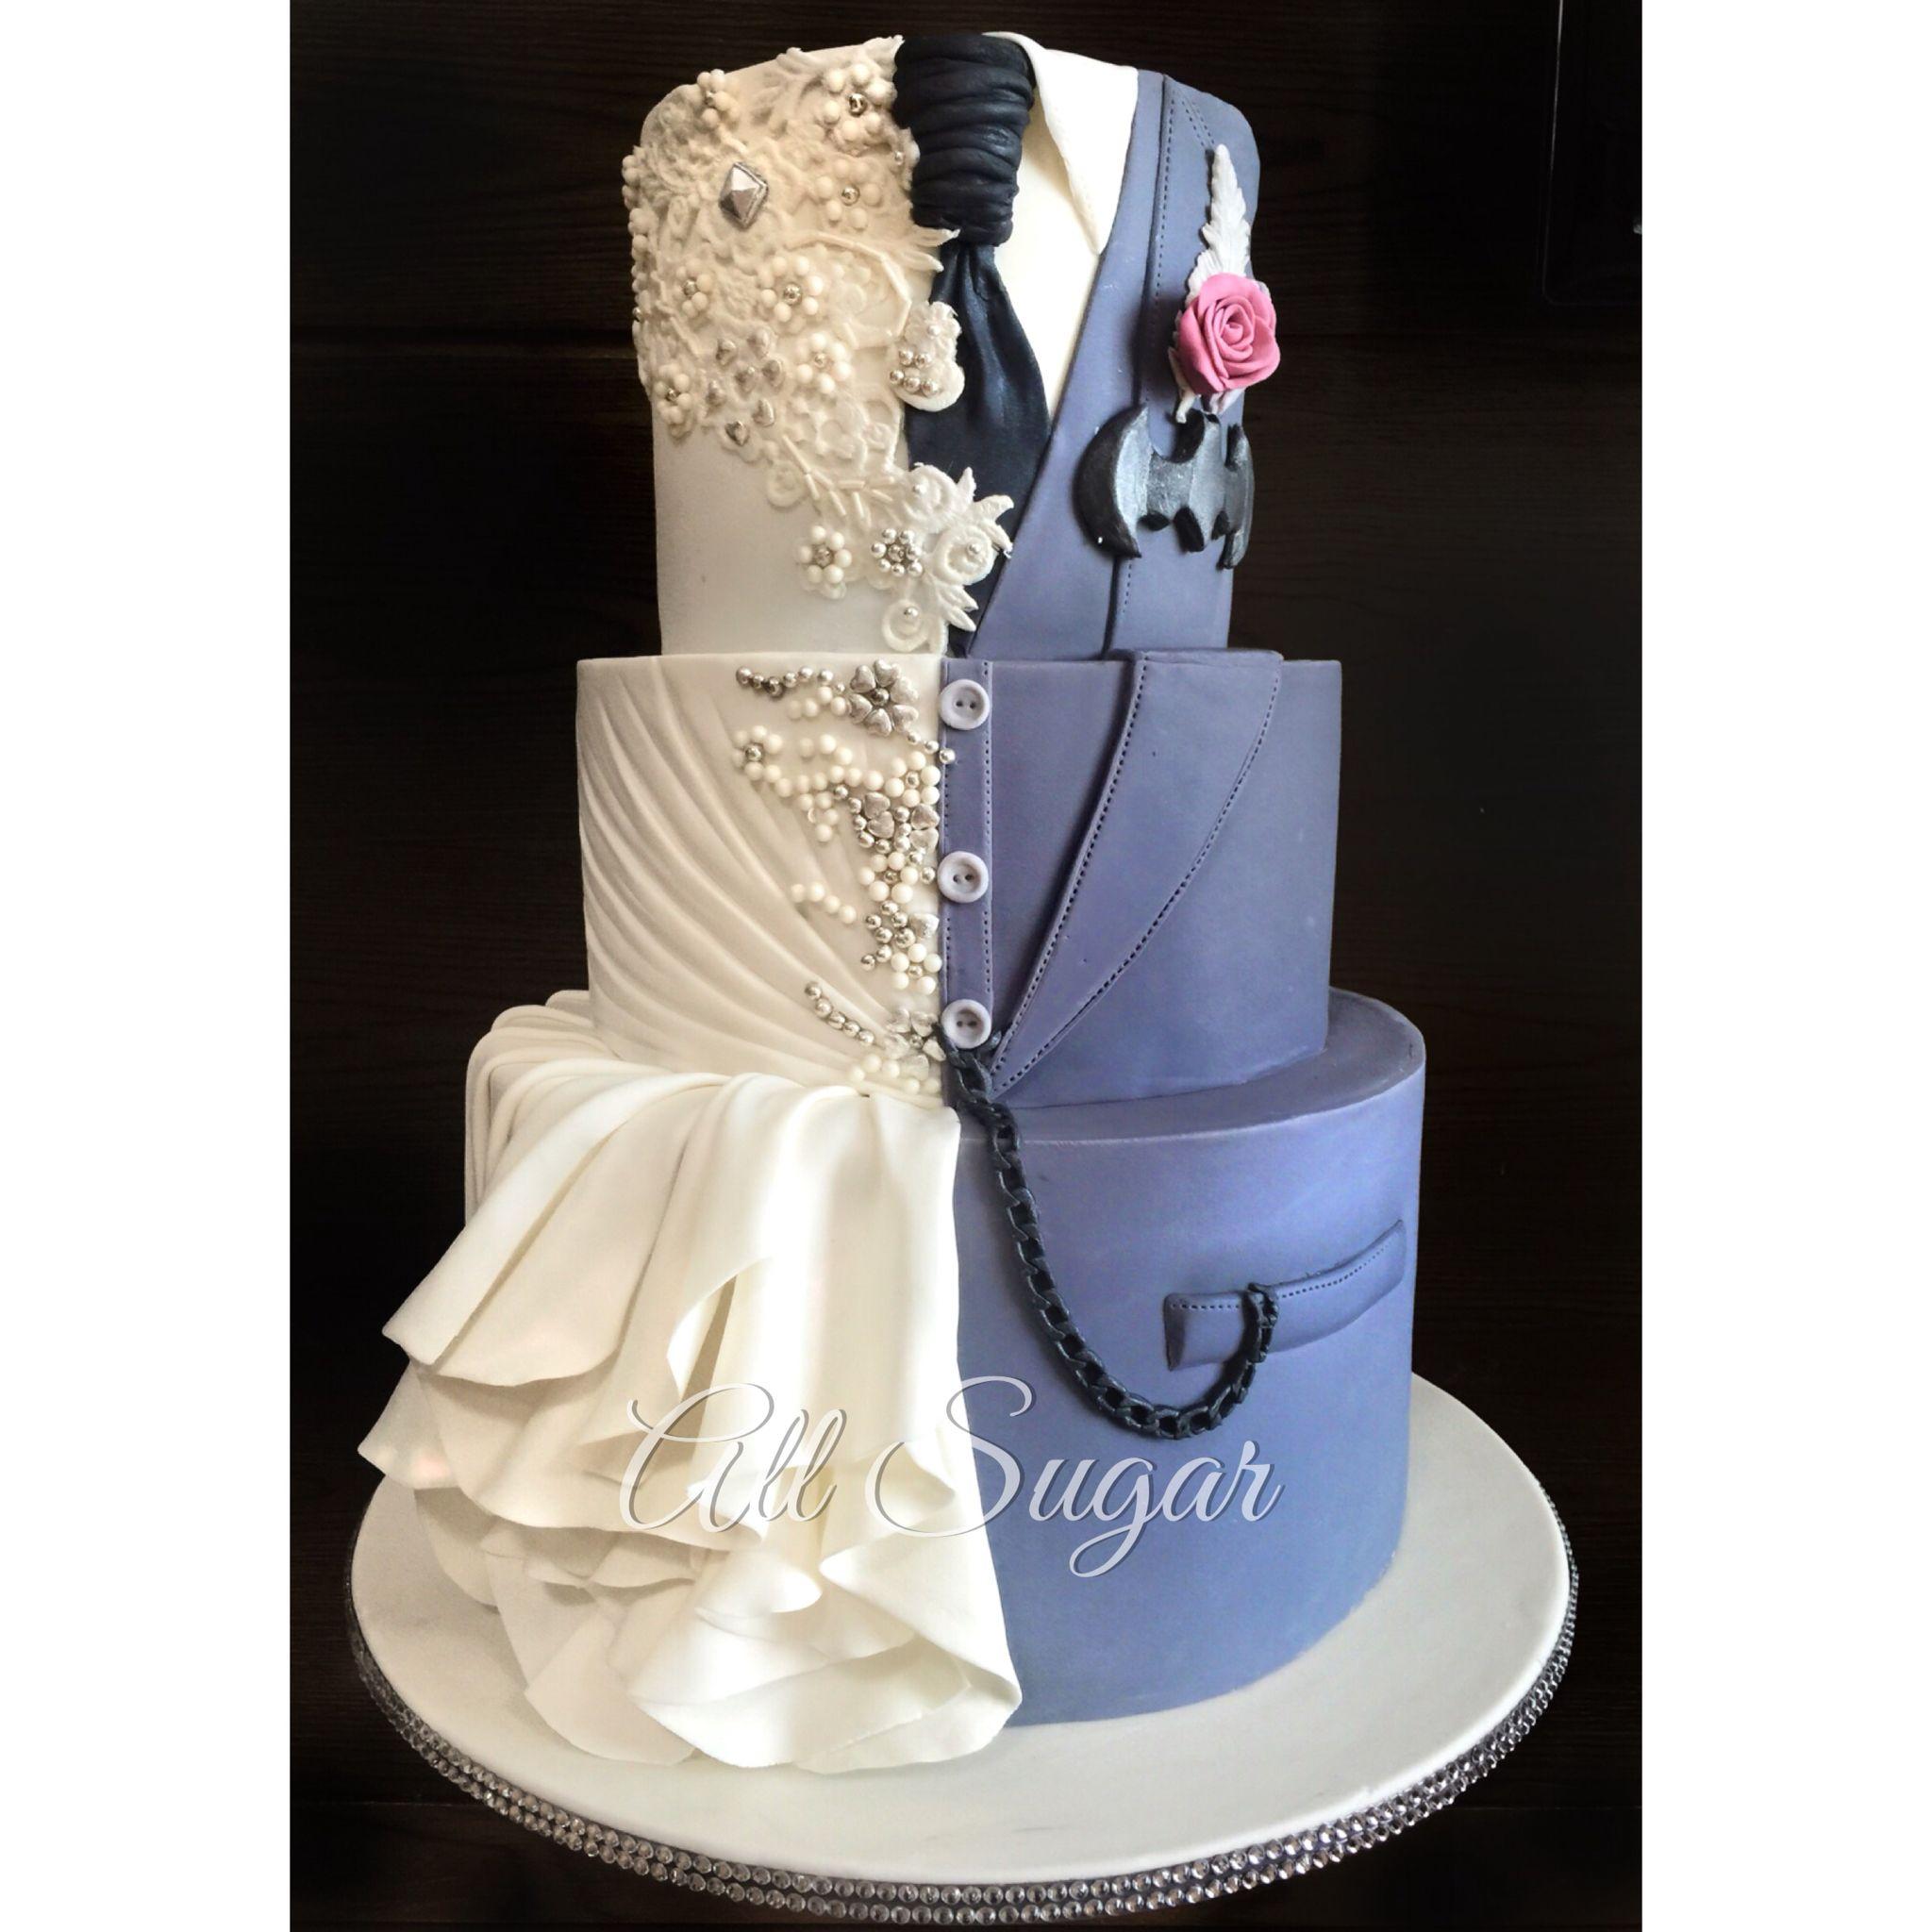 Custom Wedding Cake Dress Inspired Dual Design Superhero Batman